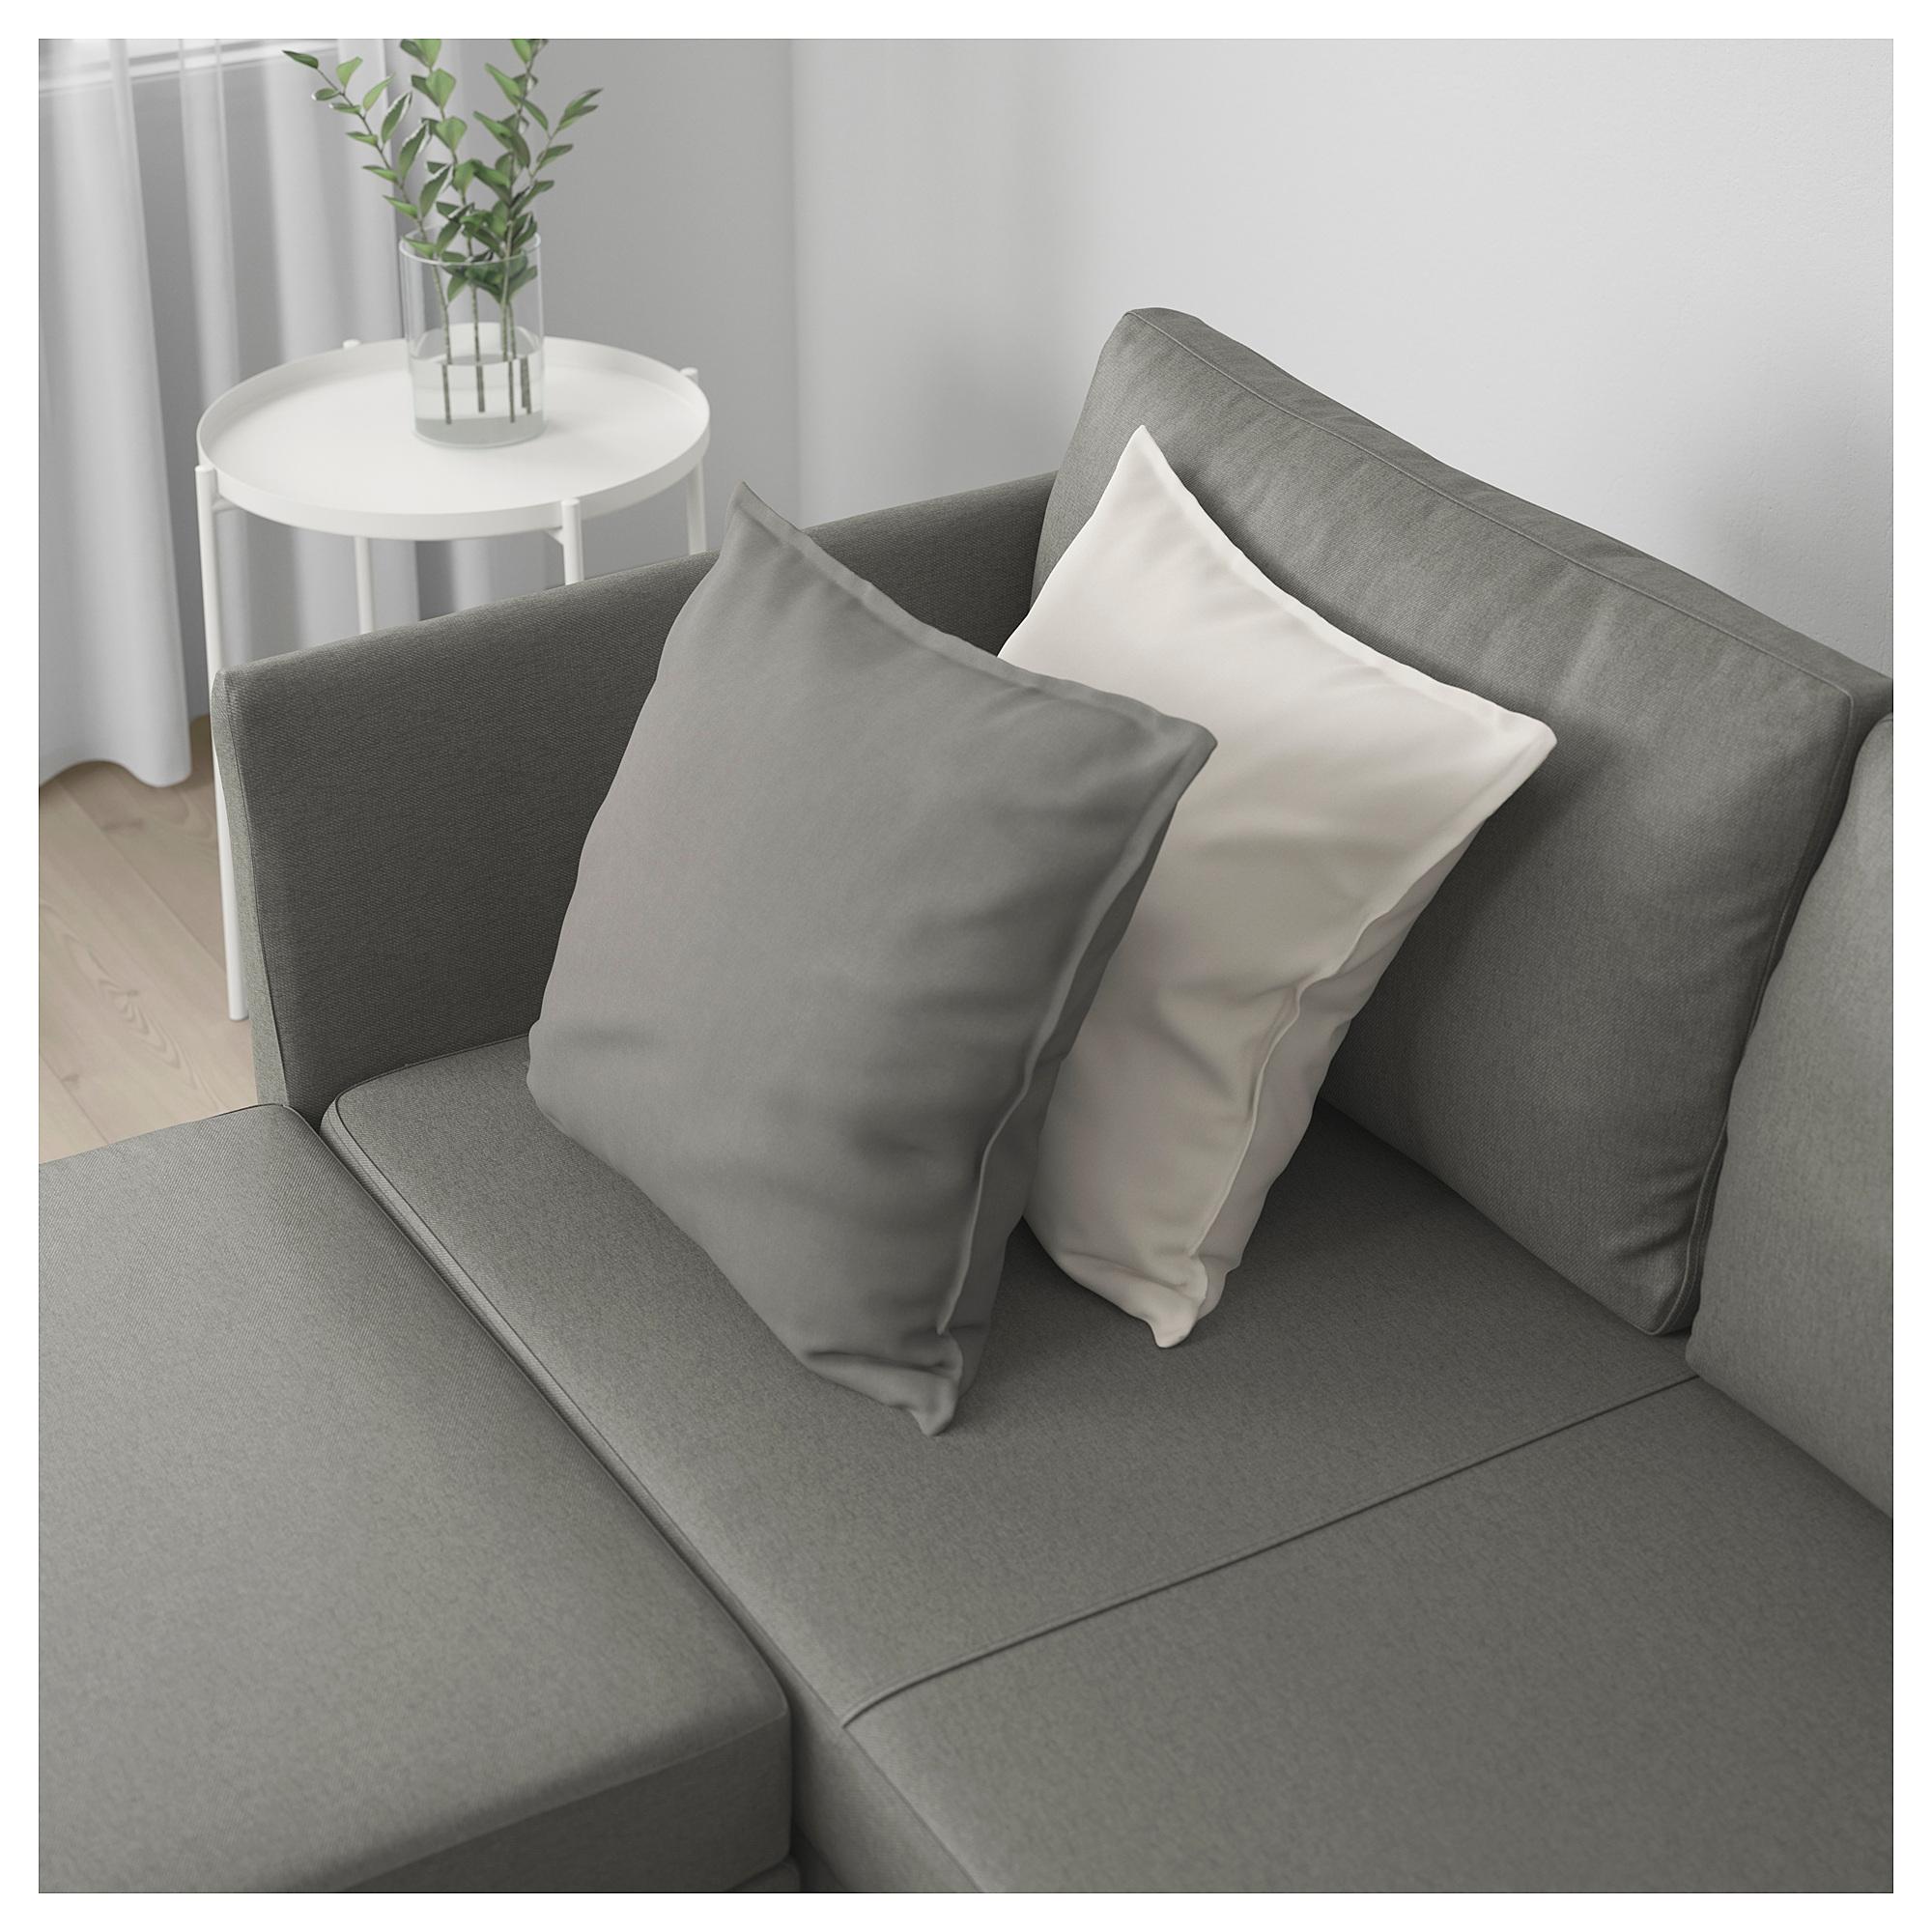 Br 197 Thult Corner Sofa Bed Borred Grey Green Ikea Indonesia